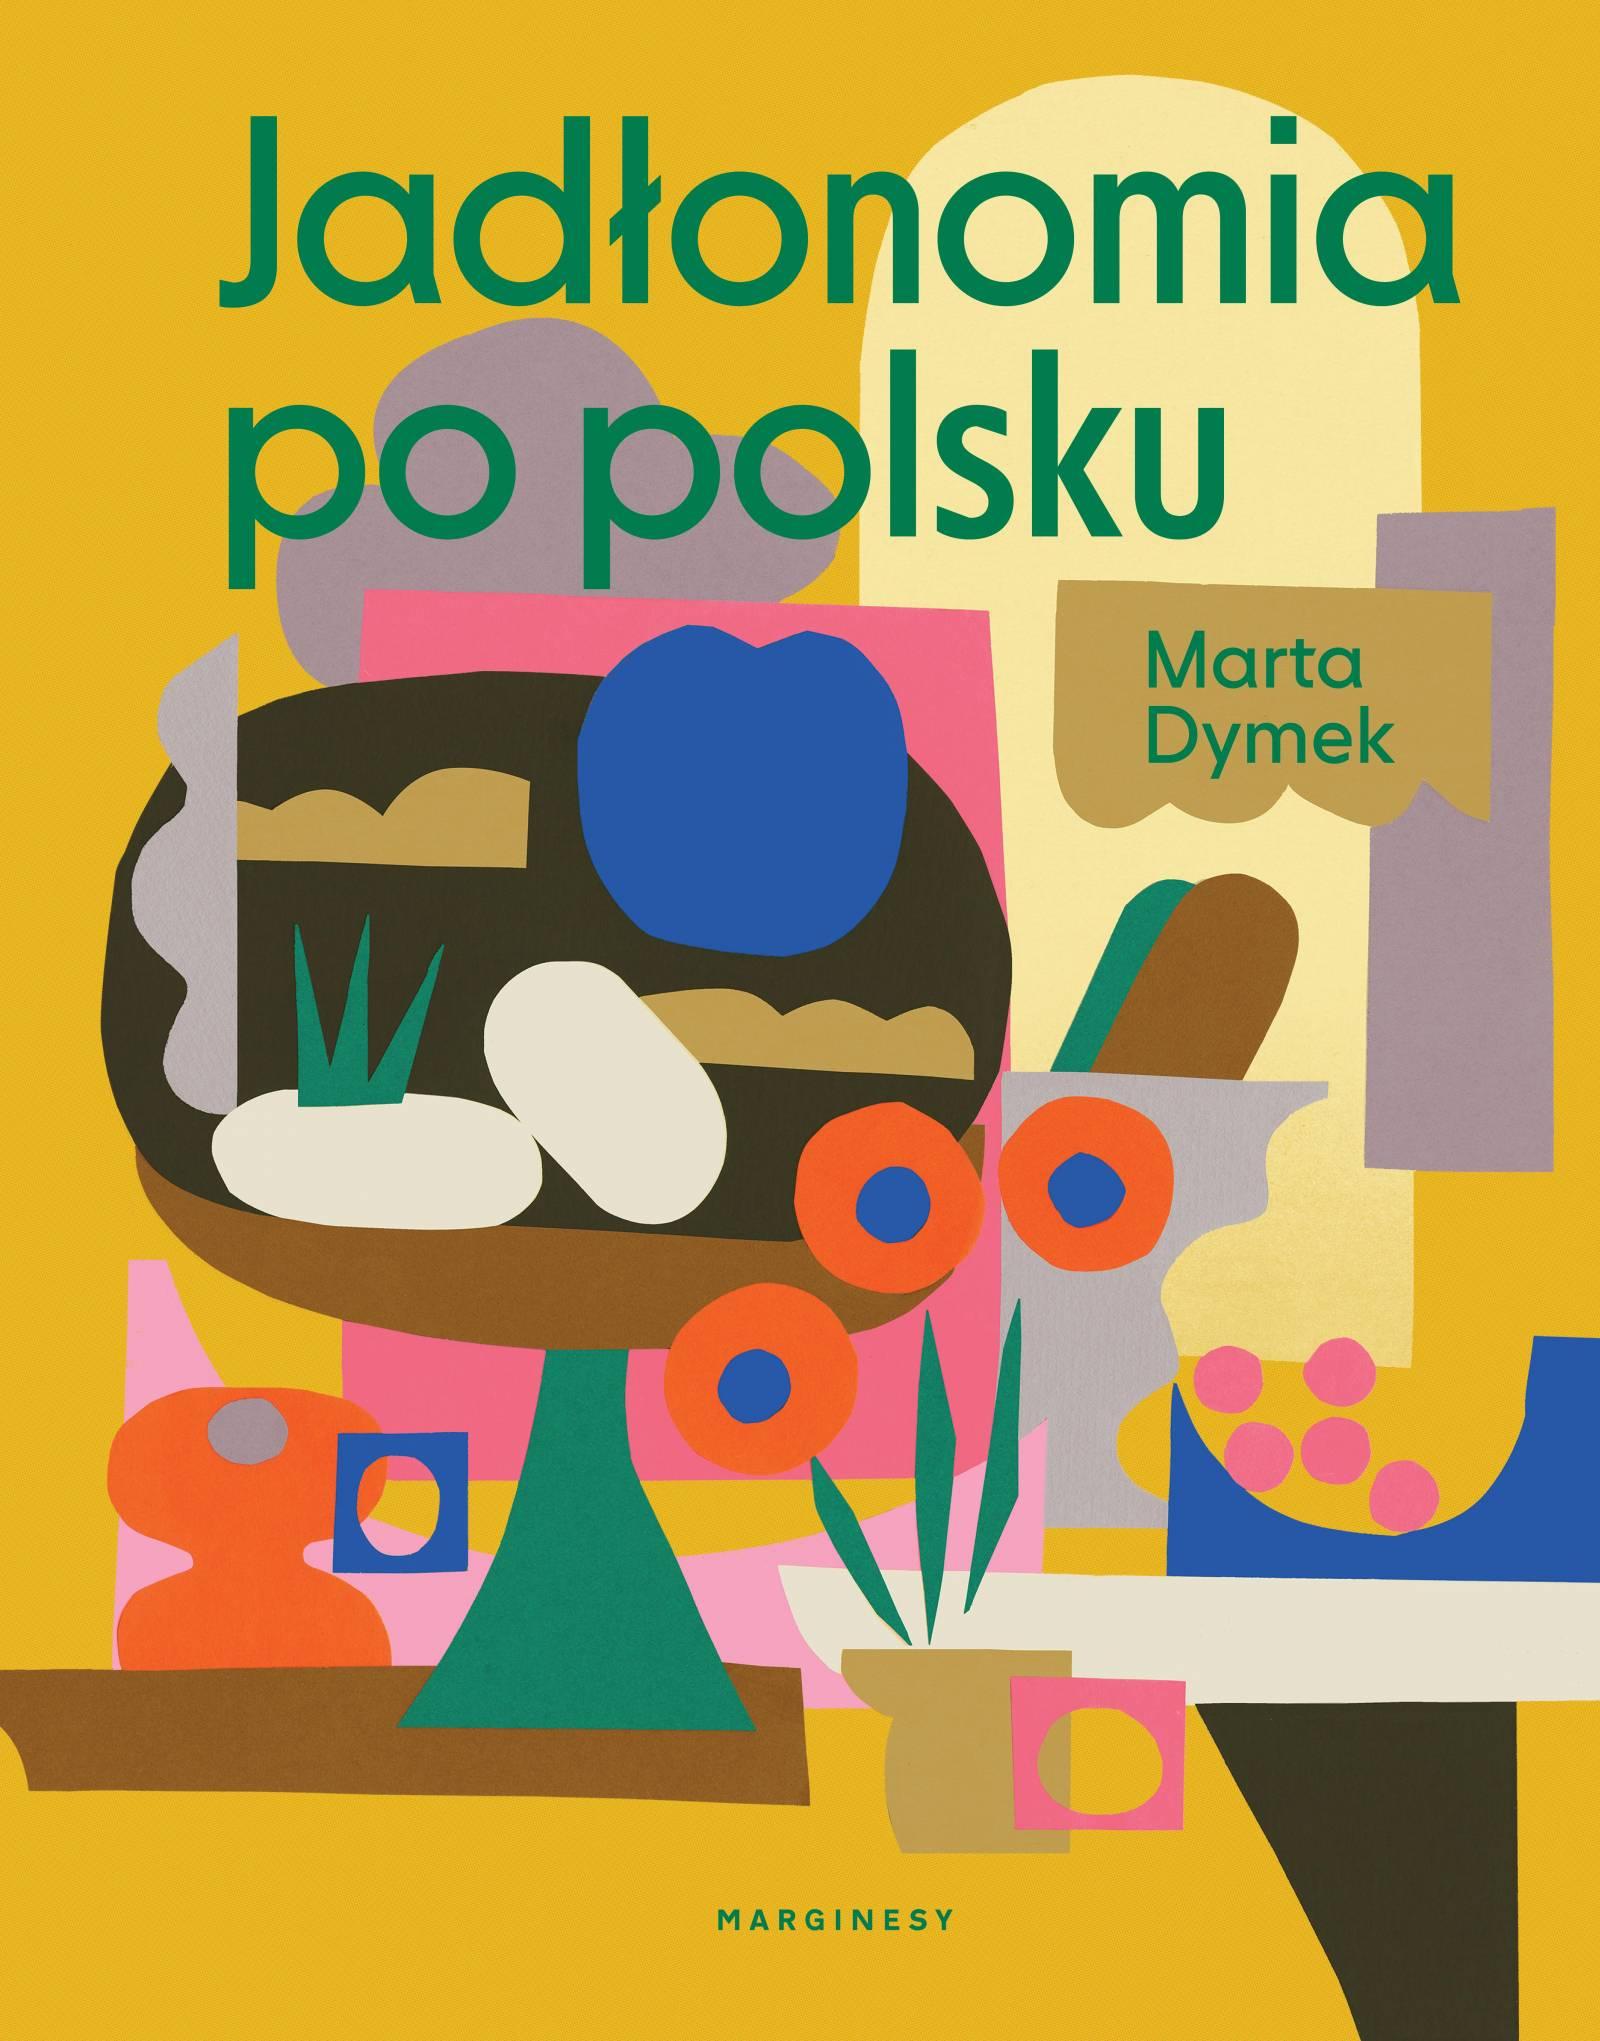 Premierowo Na Vogue Pl Jadlonomia Po Polsku